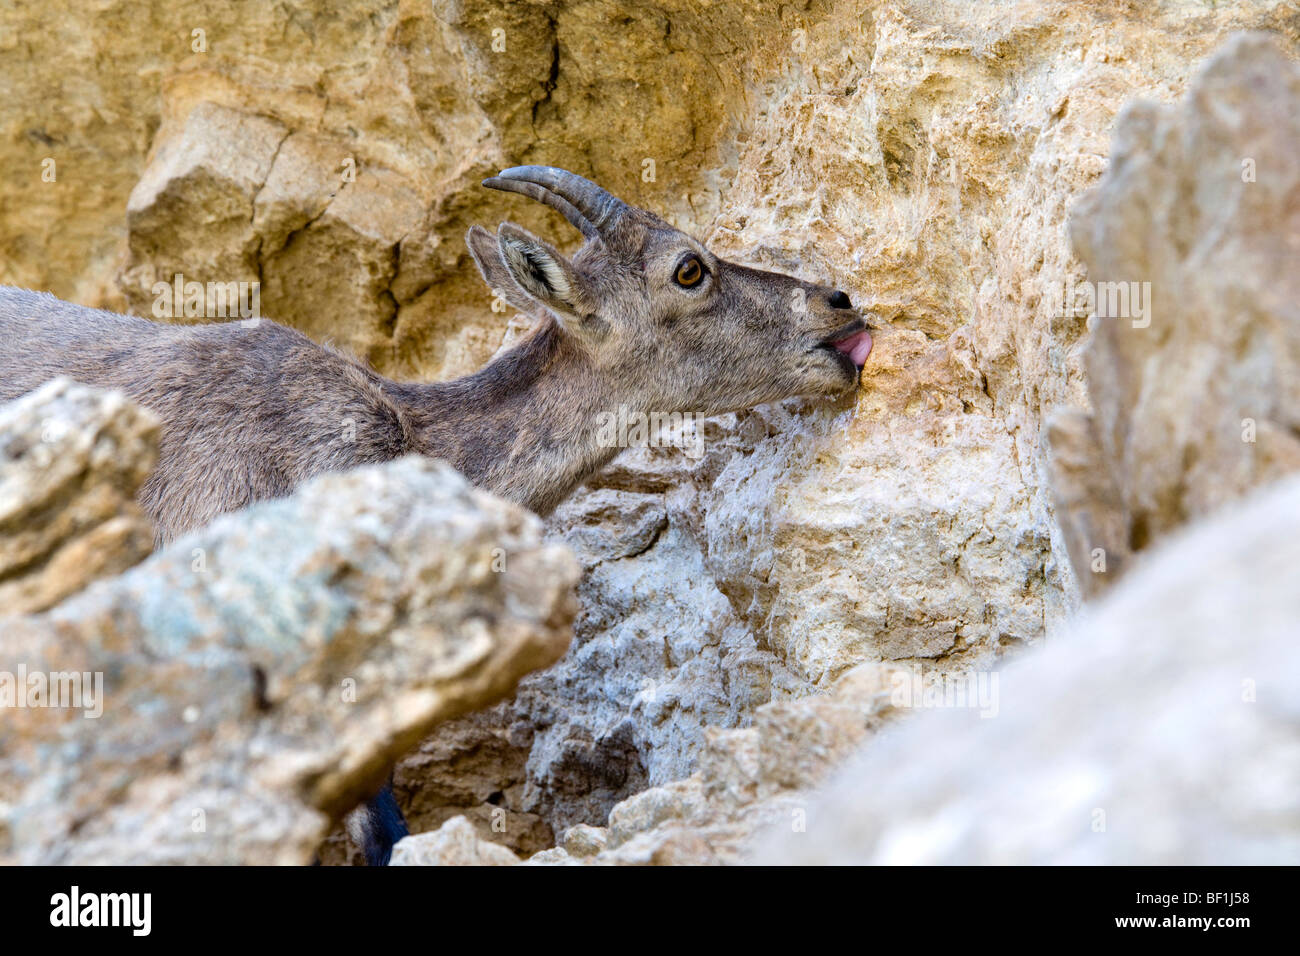 Capra ibex female tongue lingua salt stambecco femmina lecca sale minerale montagna mountain Cogne Parco Nazionale - Stock Image